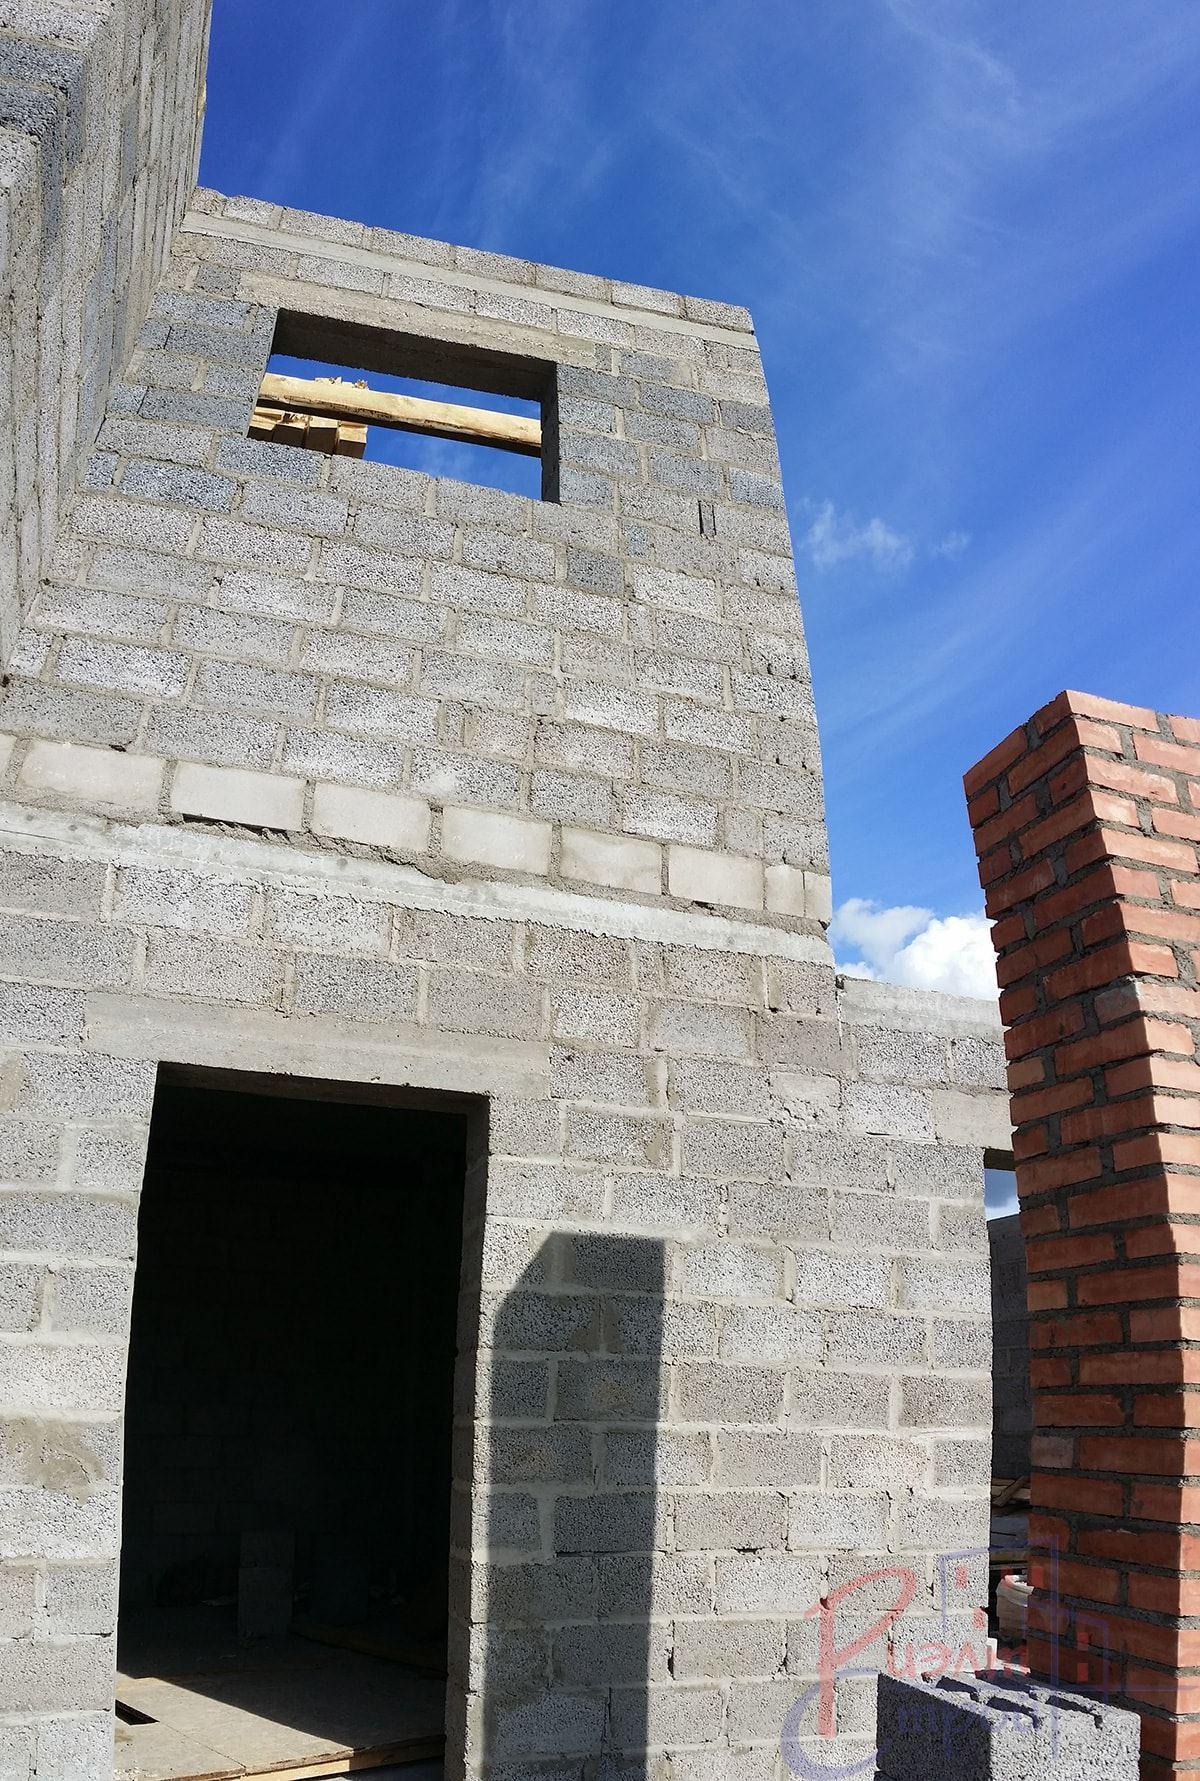 Дом 190м2 — 2016 год постройки, фото 3